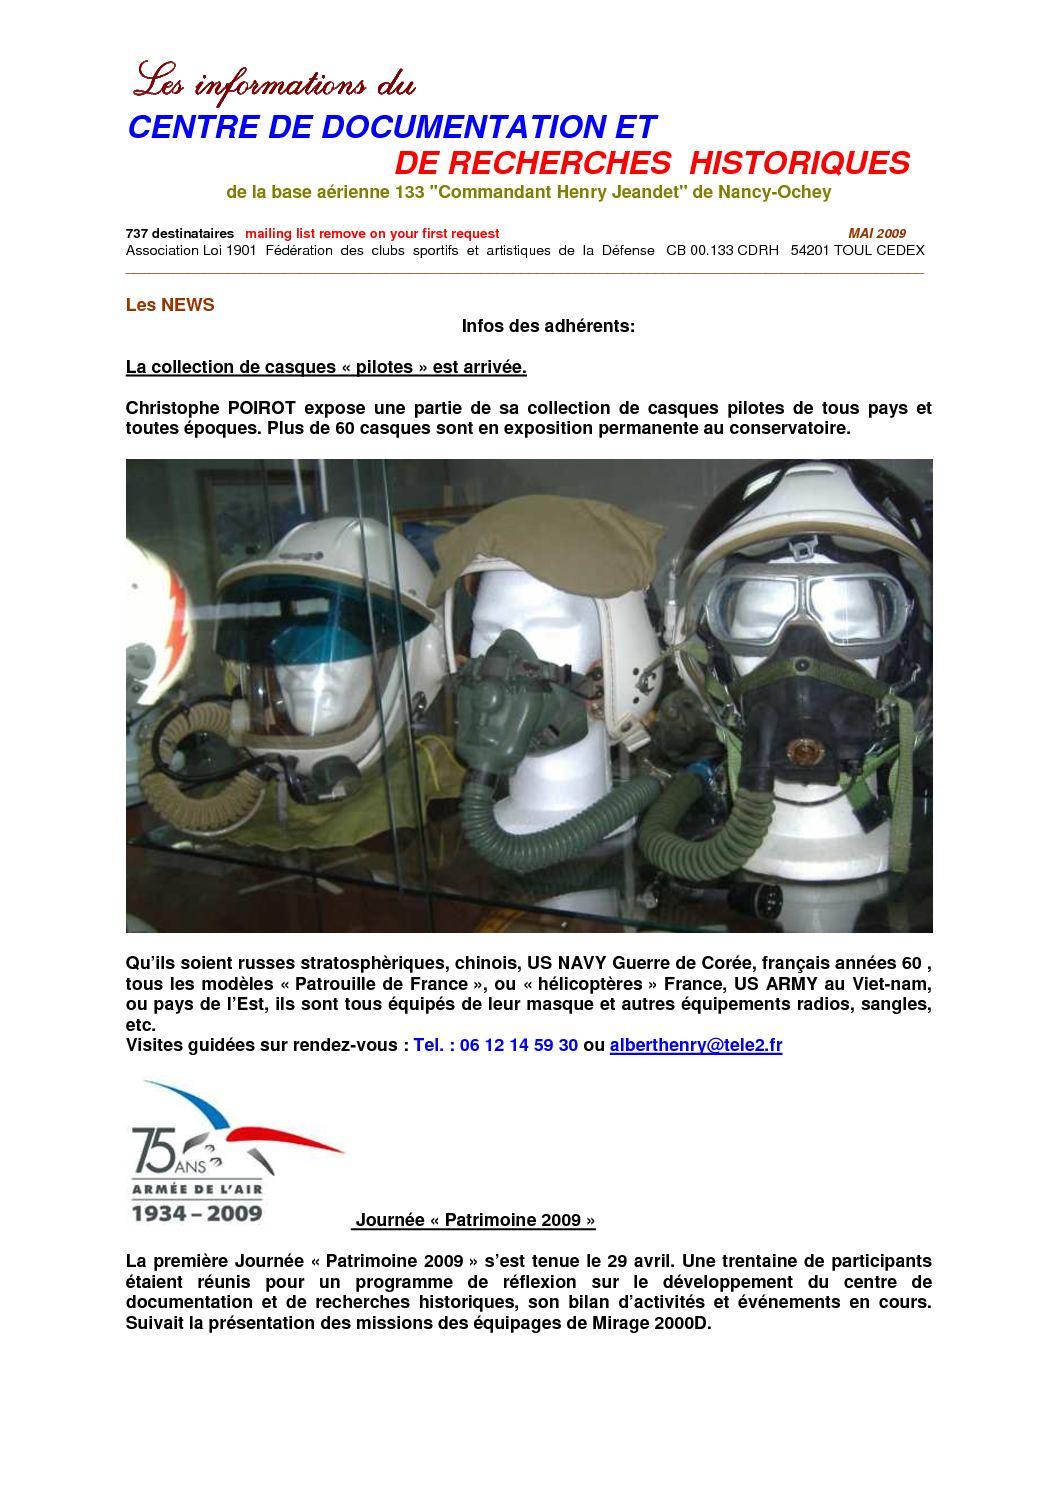 5 - Lettre N°5 infos aéronautiques du CDRH NANCY-OCHEY Mai 2009